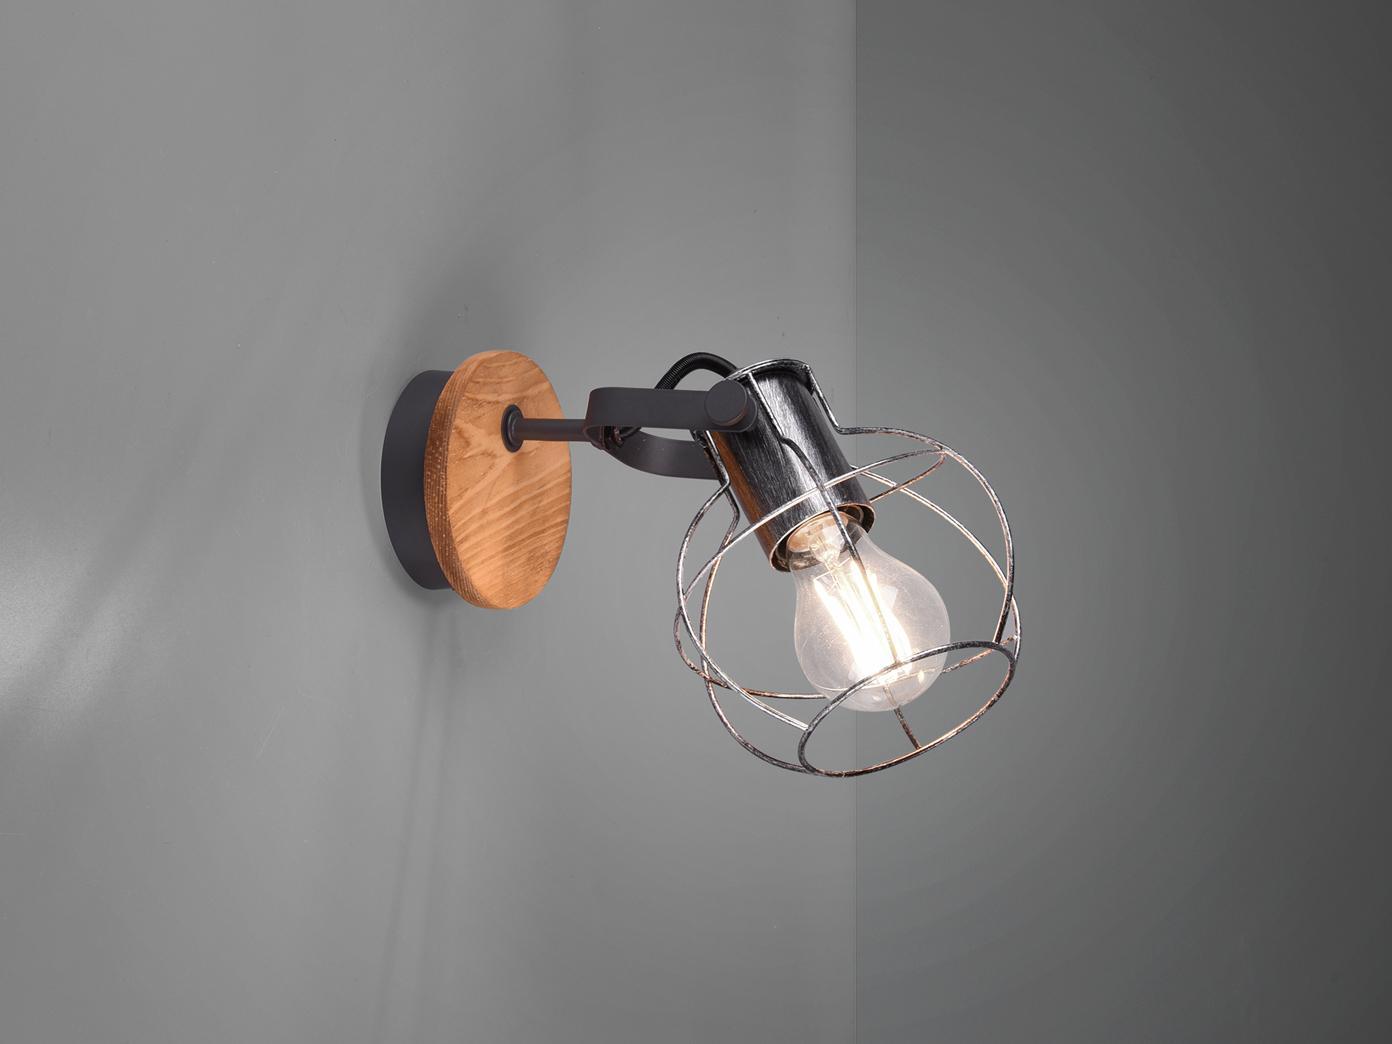 Wandlampe Küche Retro